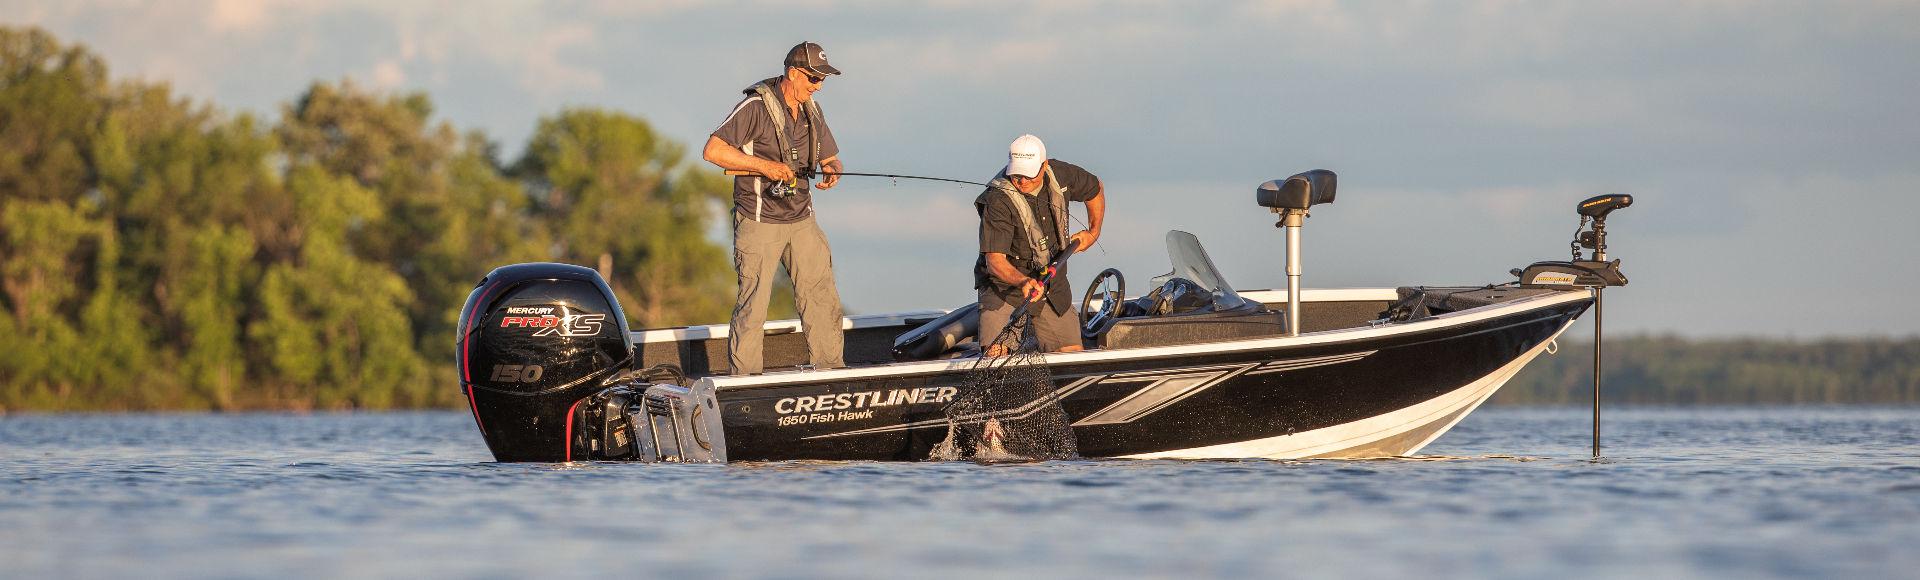 Crestliner Fish Hawk 1850 SC